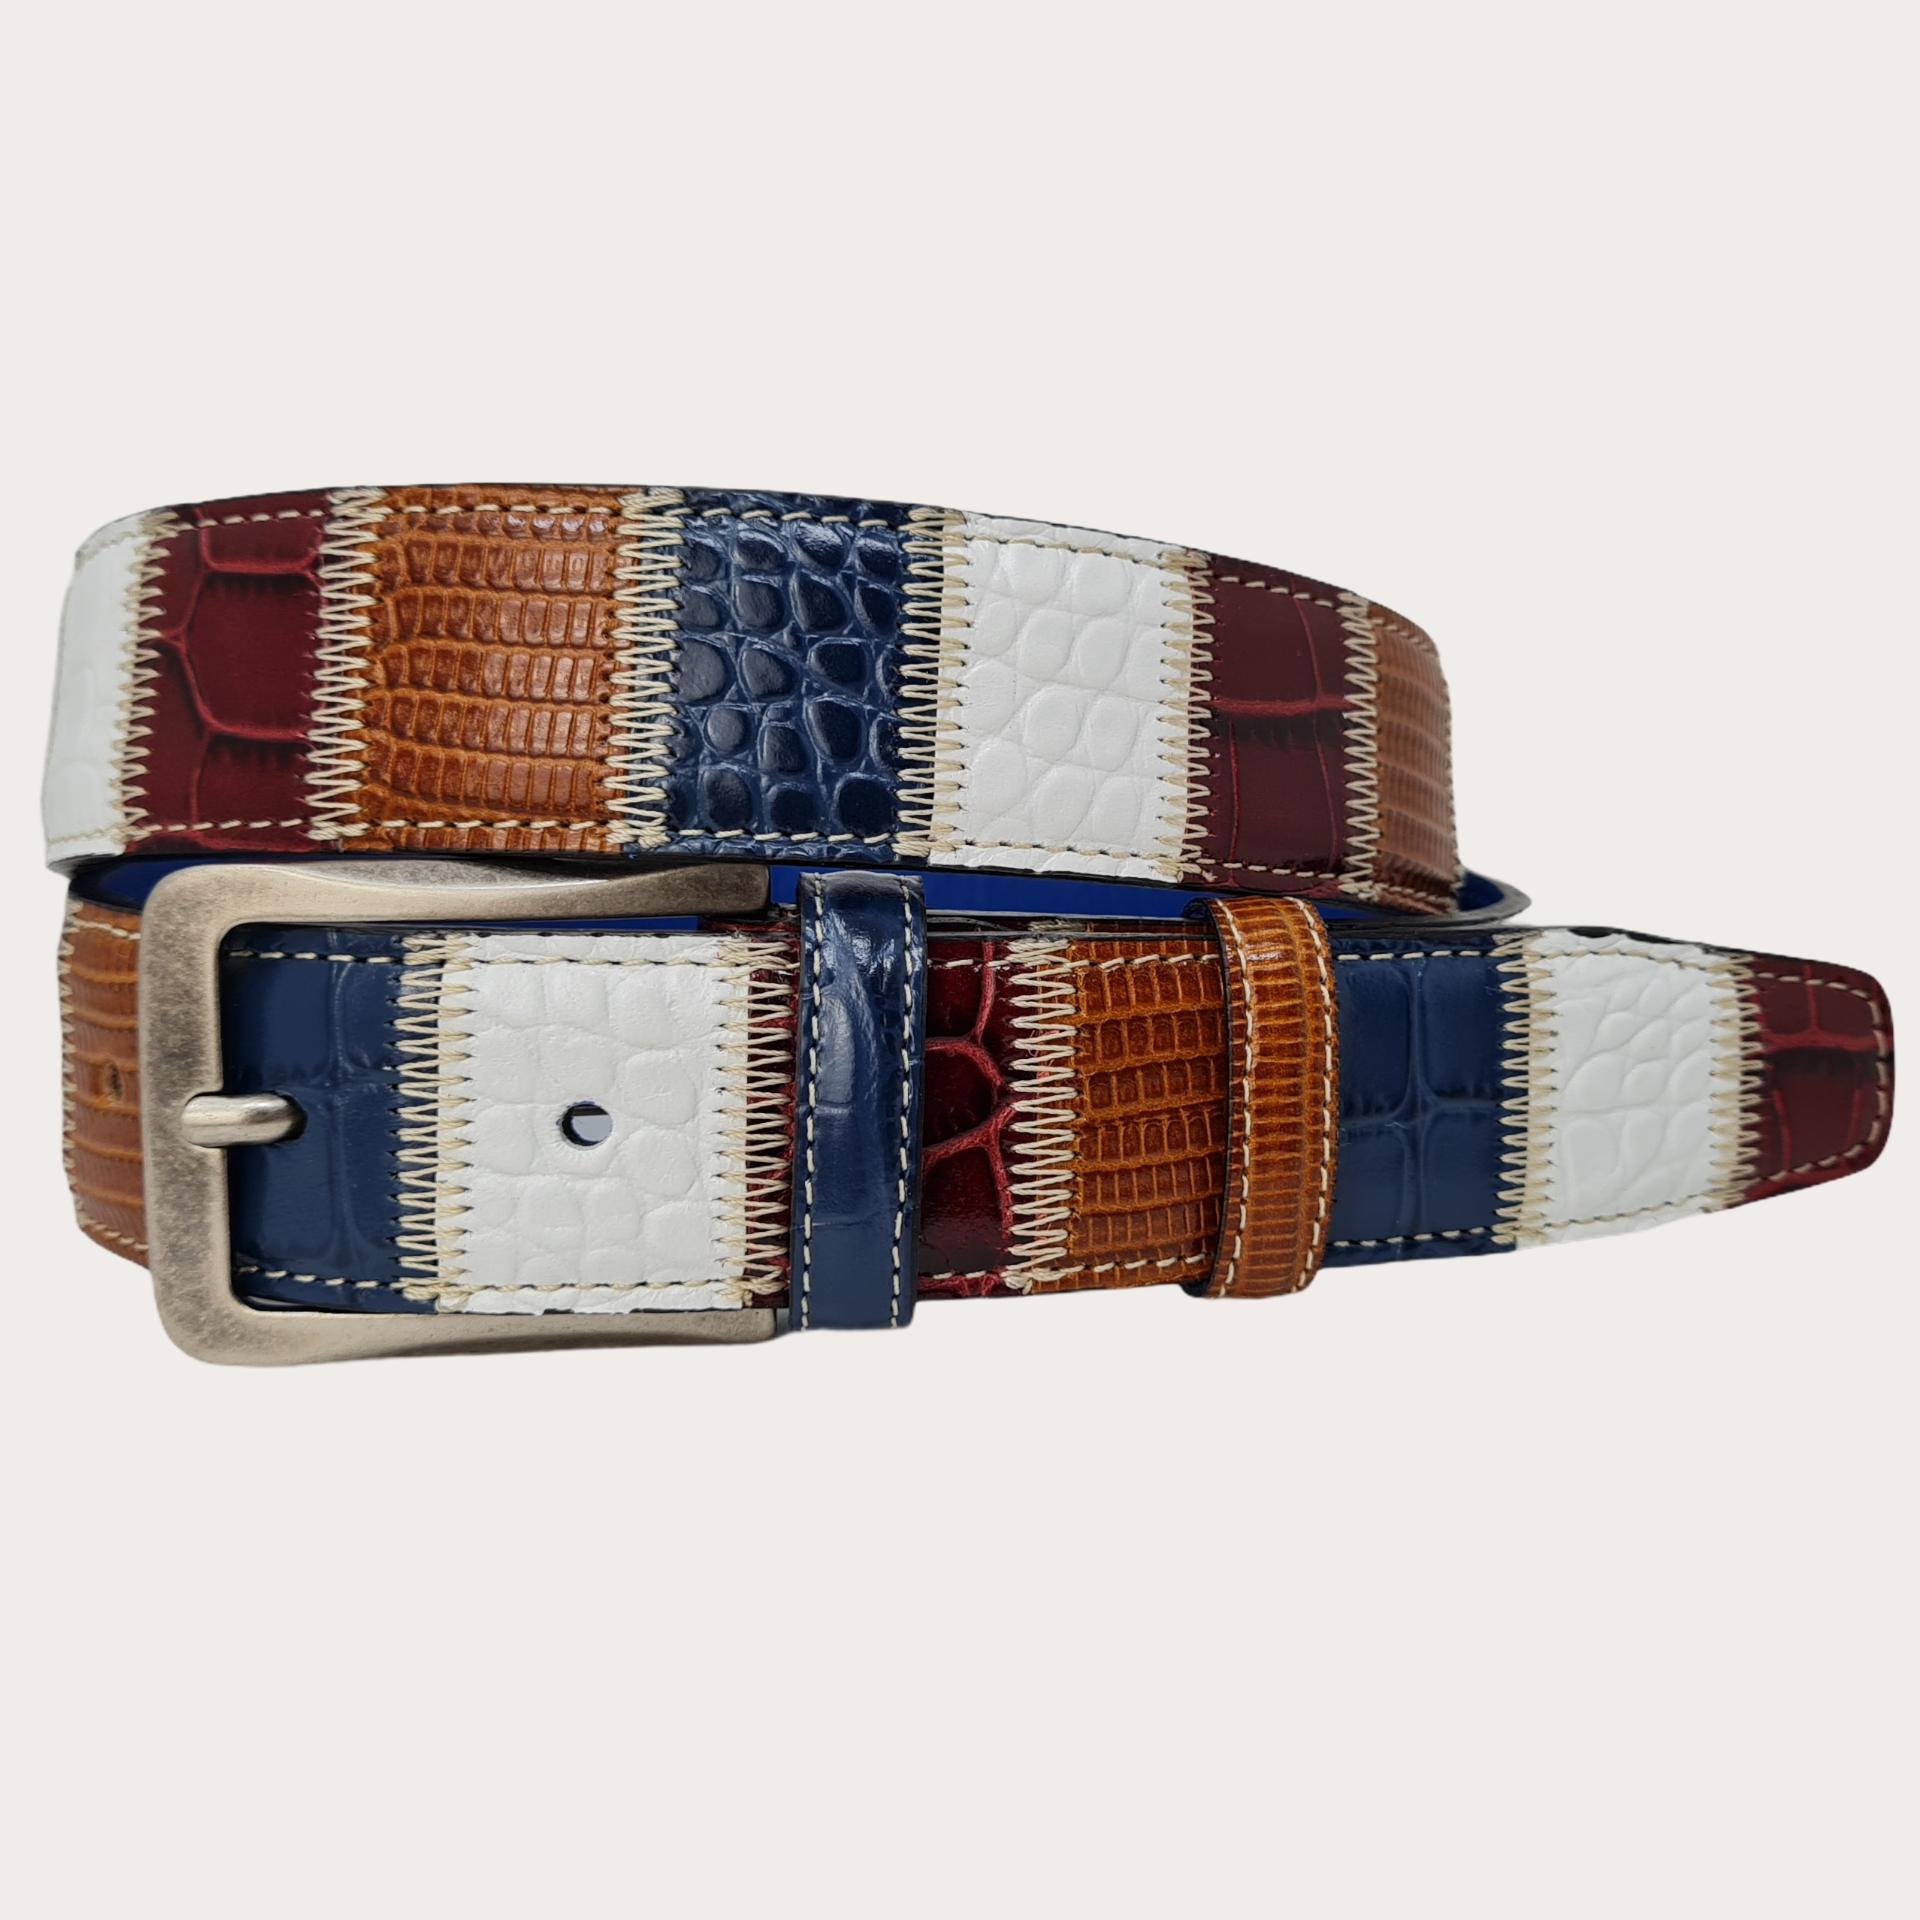 Genuine leather belt, multicolor patchwork